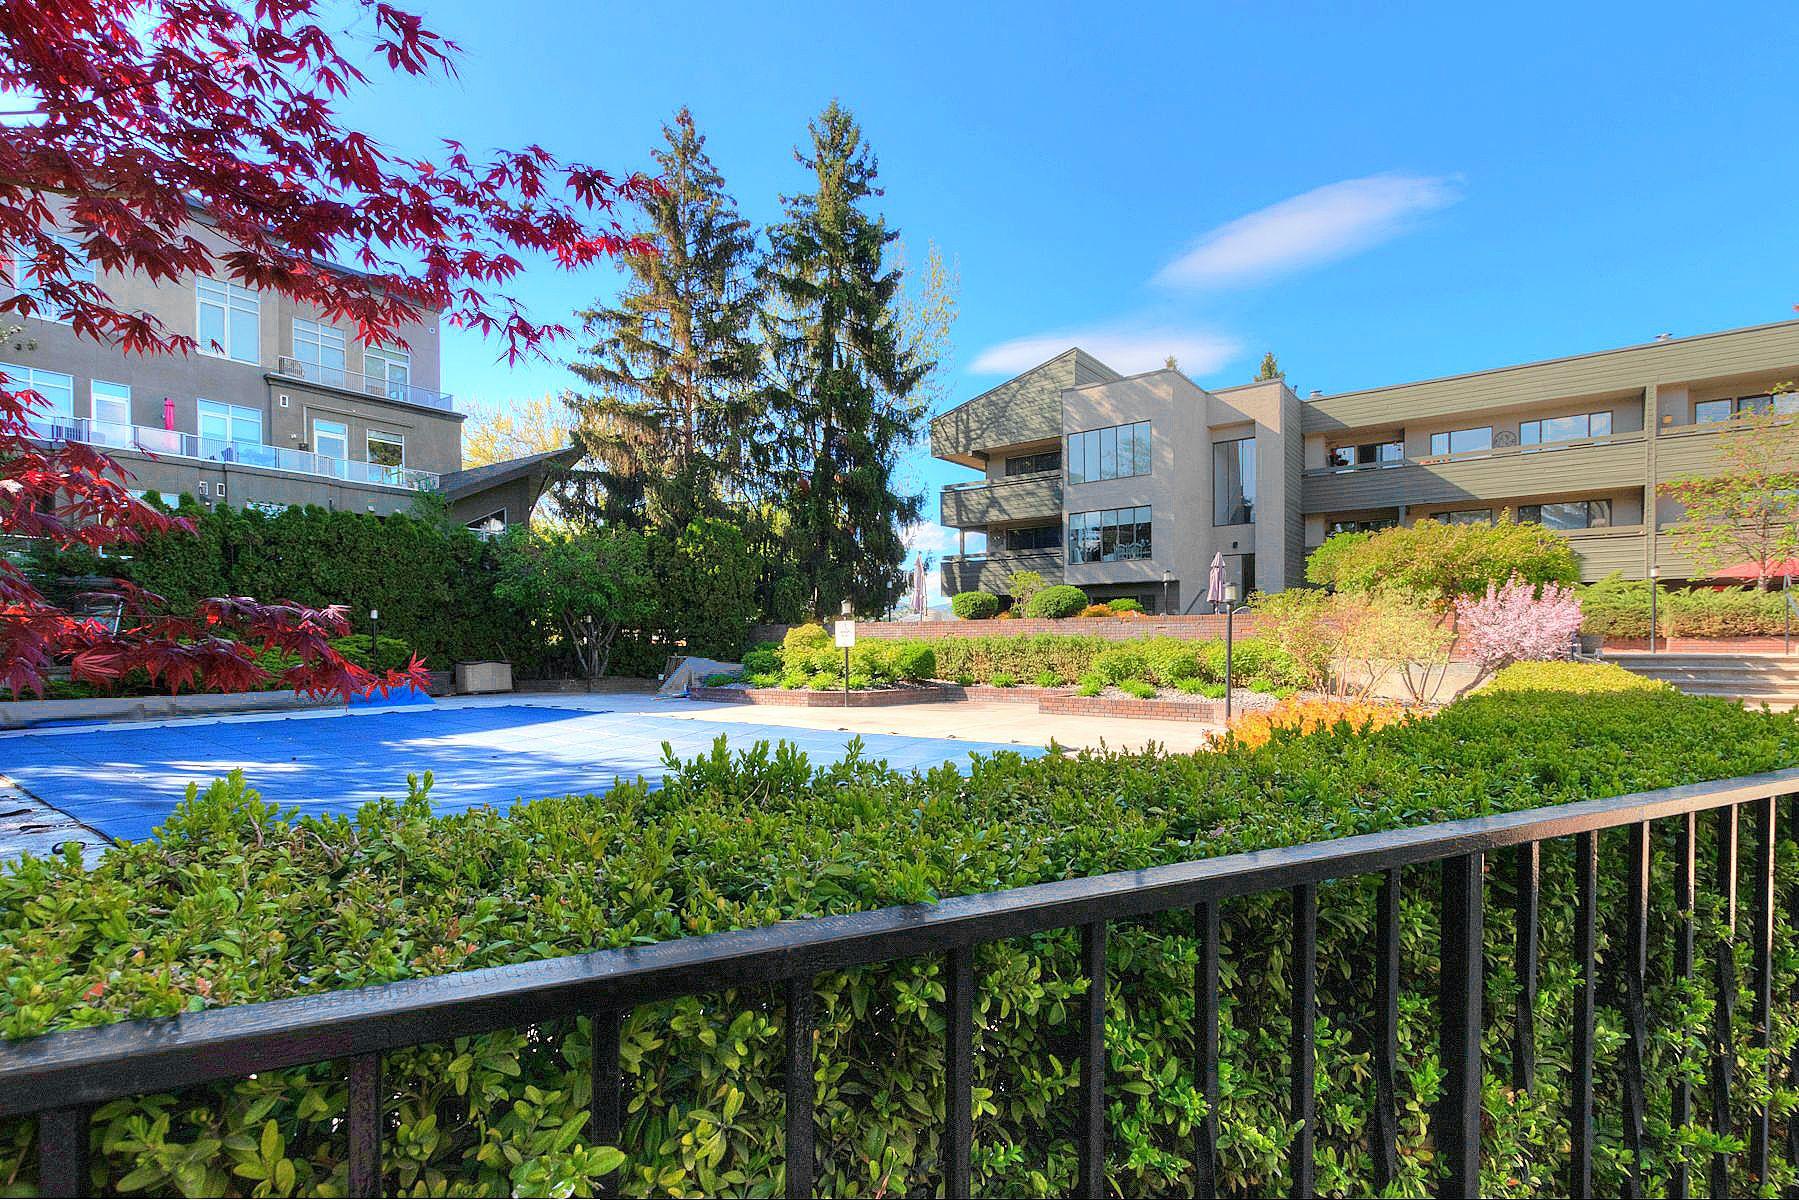 Main Photo: 219 1056 Bernard Avenue in Kelowna: Kelowna North House for sale (Central Okanagan)  : MLS®# 10239718